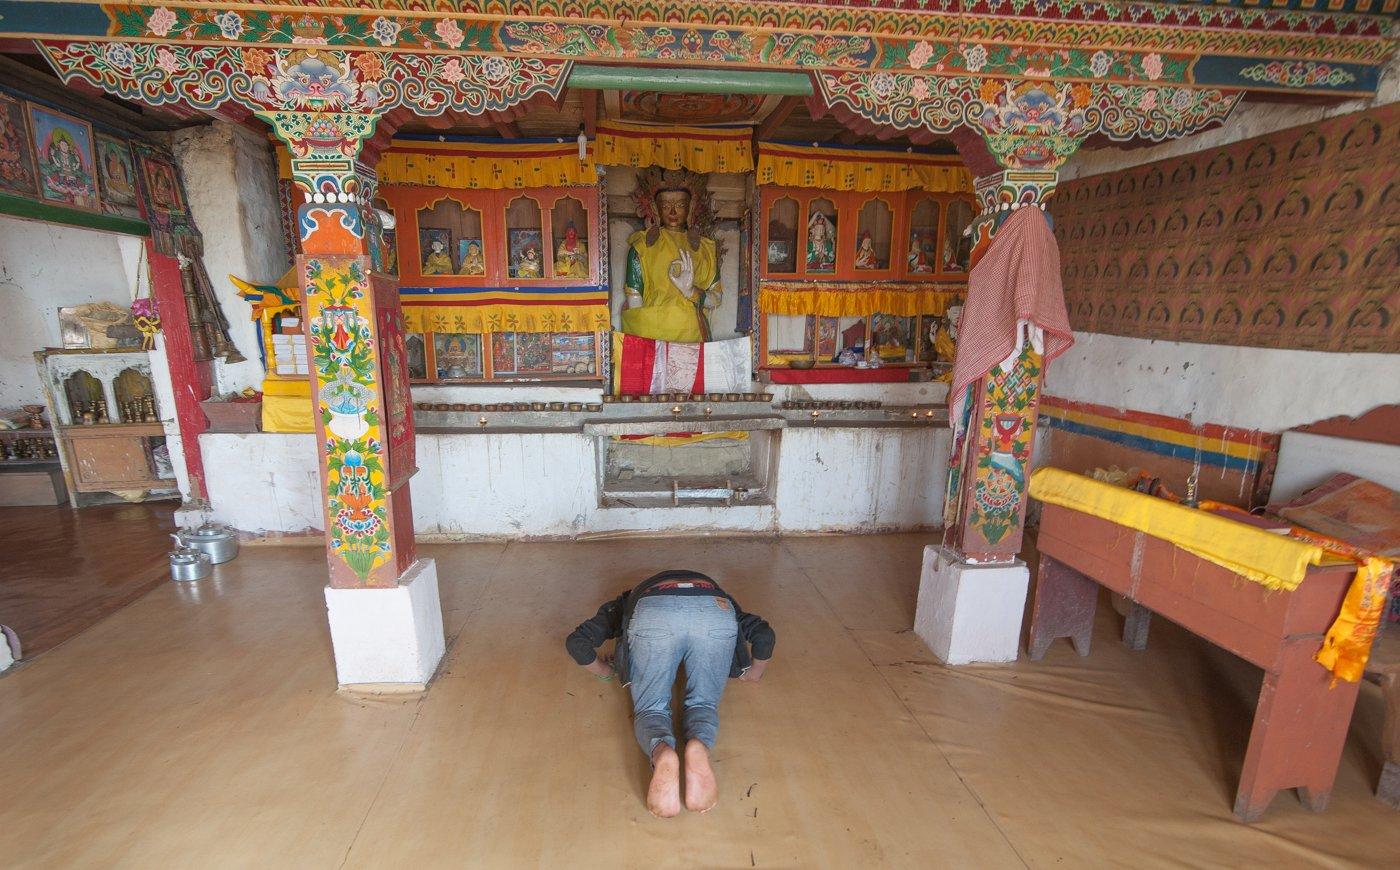 The Bropkas are devout Buddhists. Lagam has a smallgompafor prayers. Credit: Ritayan Mukherjee